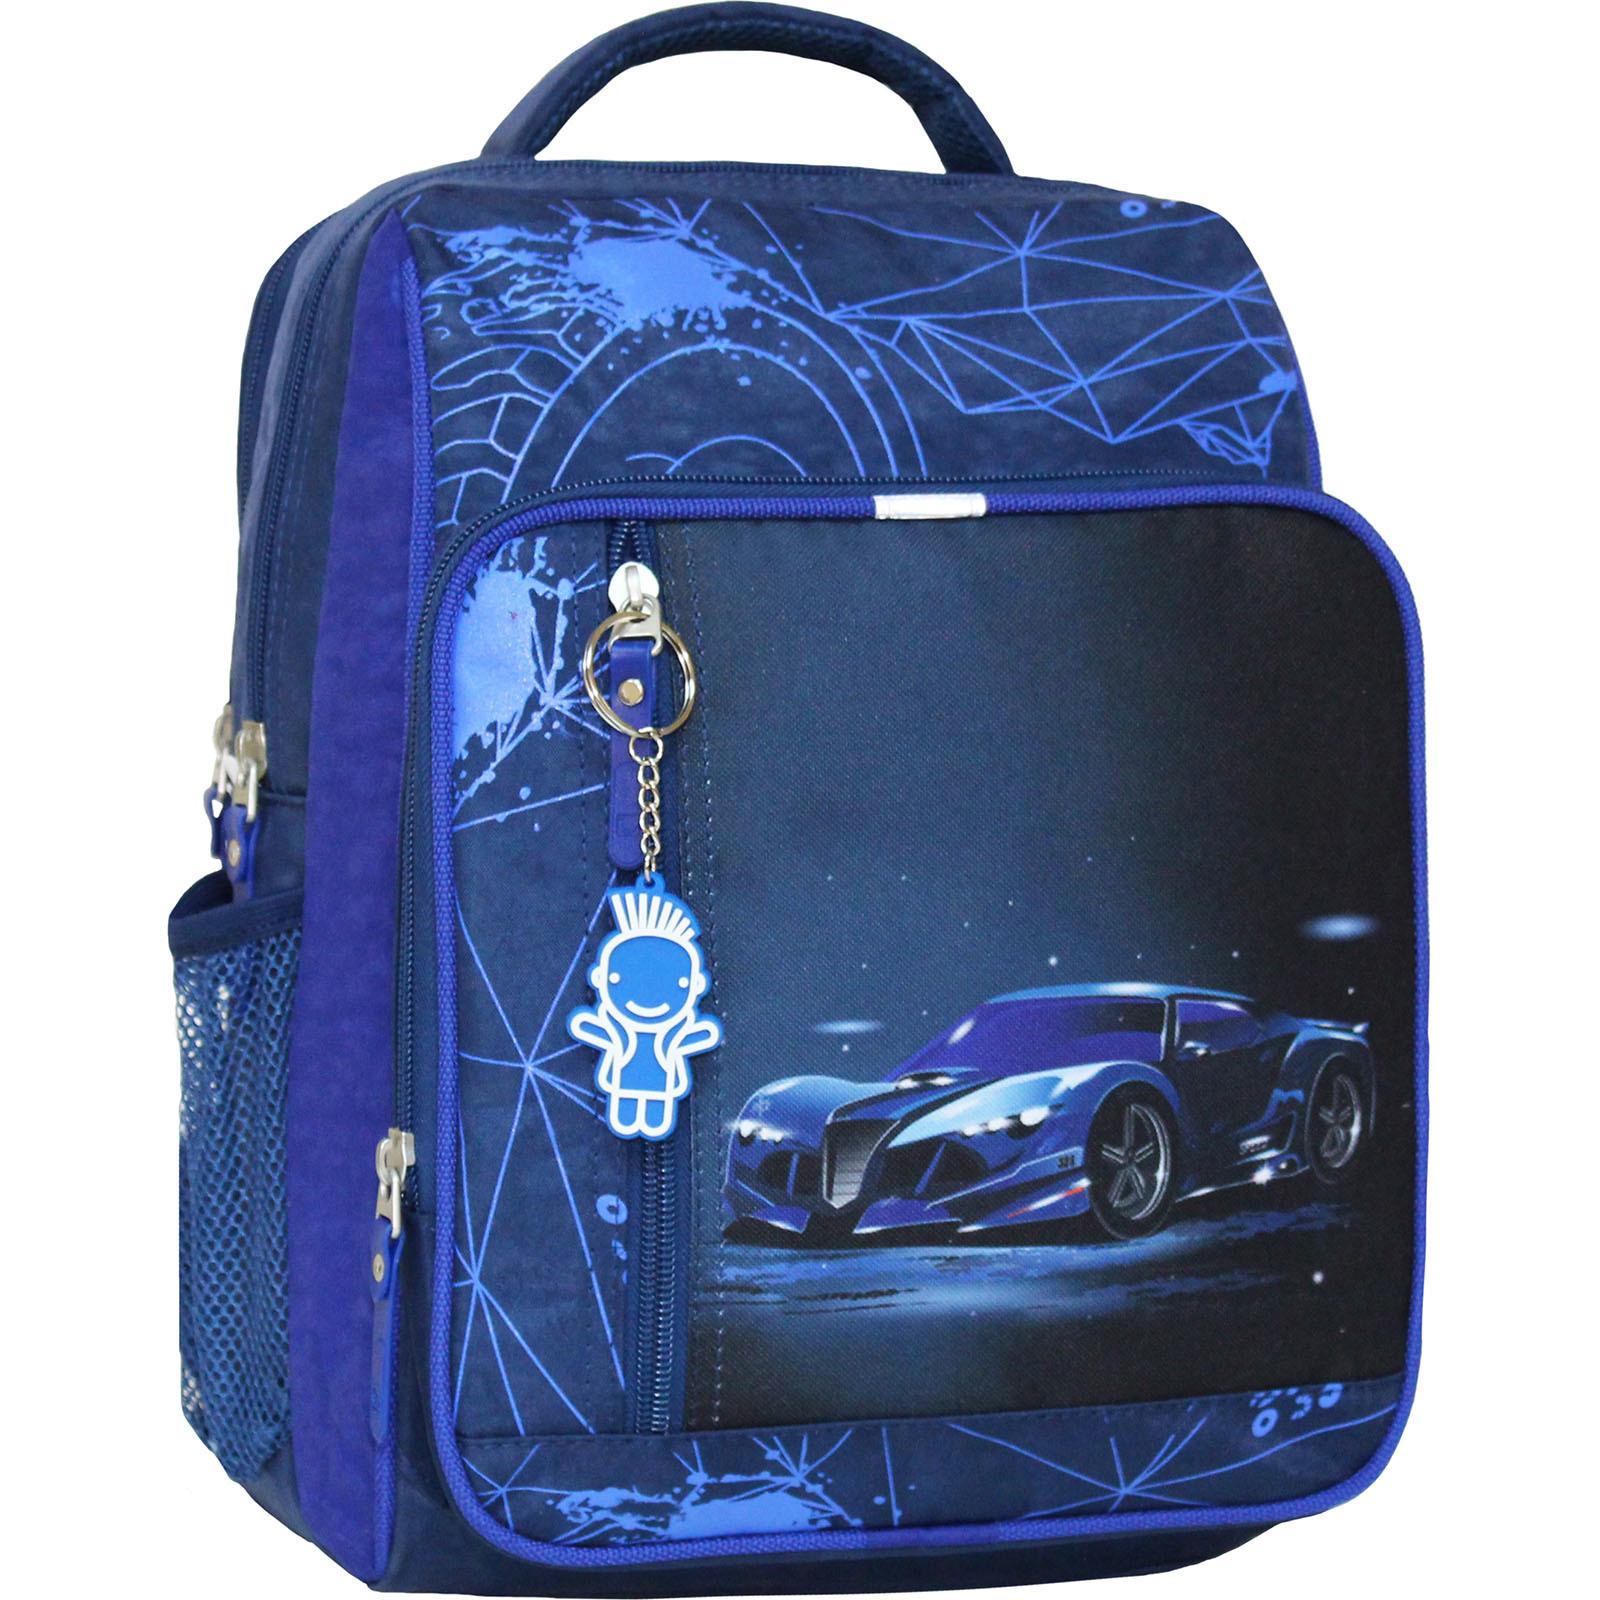 Школьные рюкзаки Рюкзак школьный Bagland Школьник 8 л. 225 синий 248к (00112702) IMG_6406_248К_.JPG